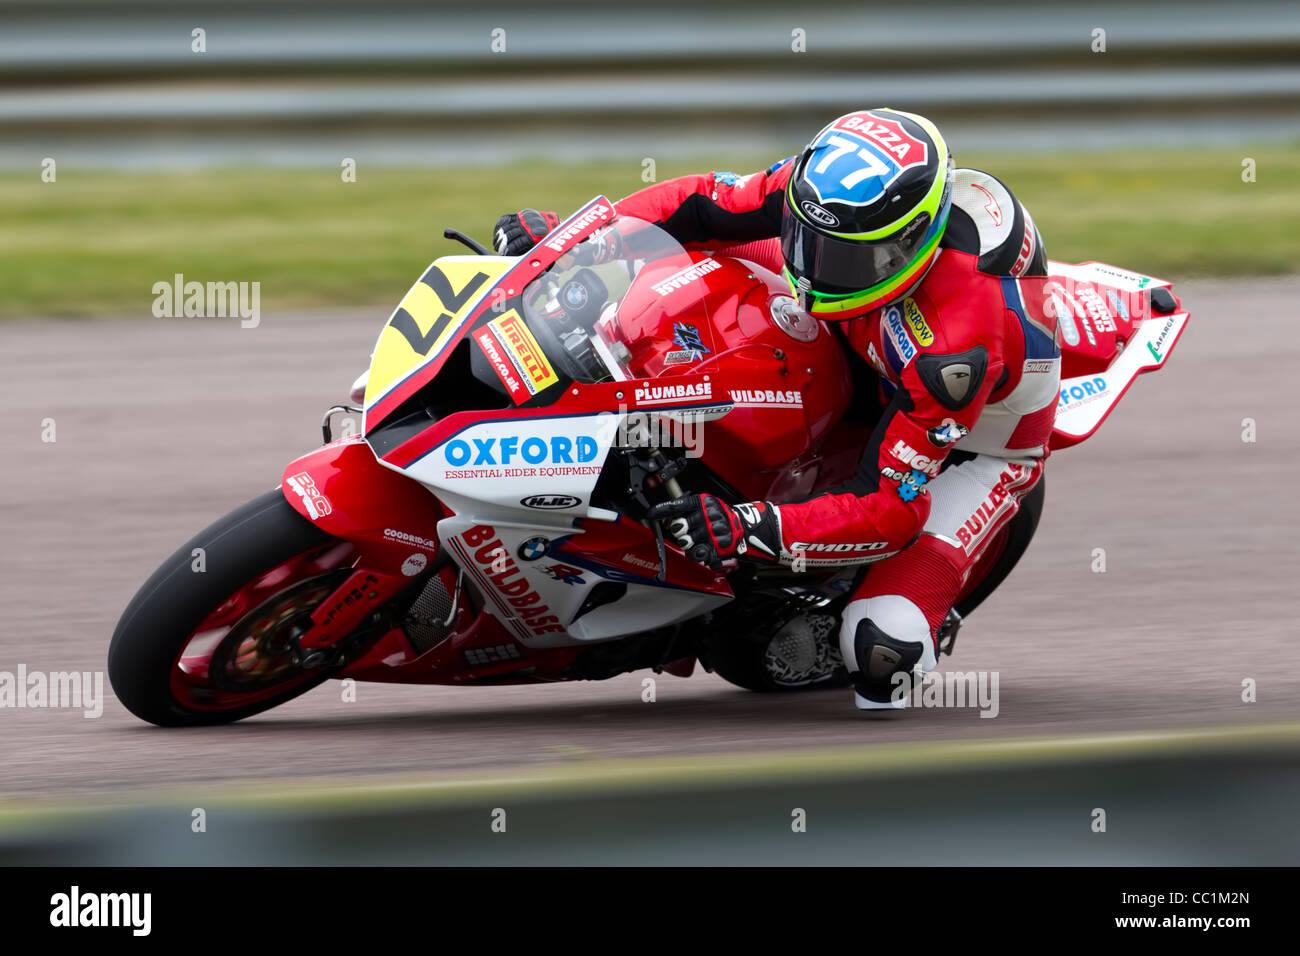 British Superbike Rider Barry Burrell riding a BMW S1000 RR. - Stock Image